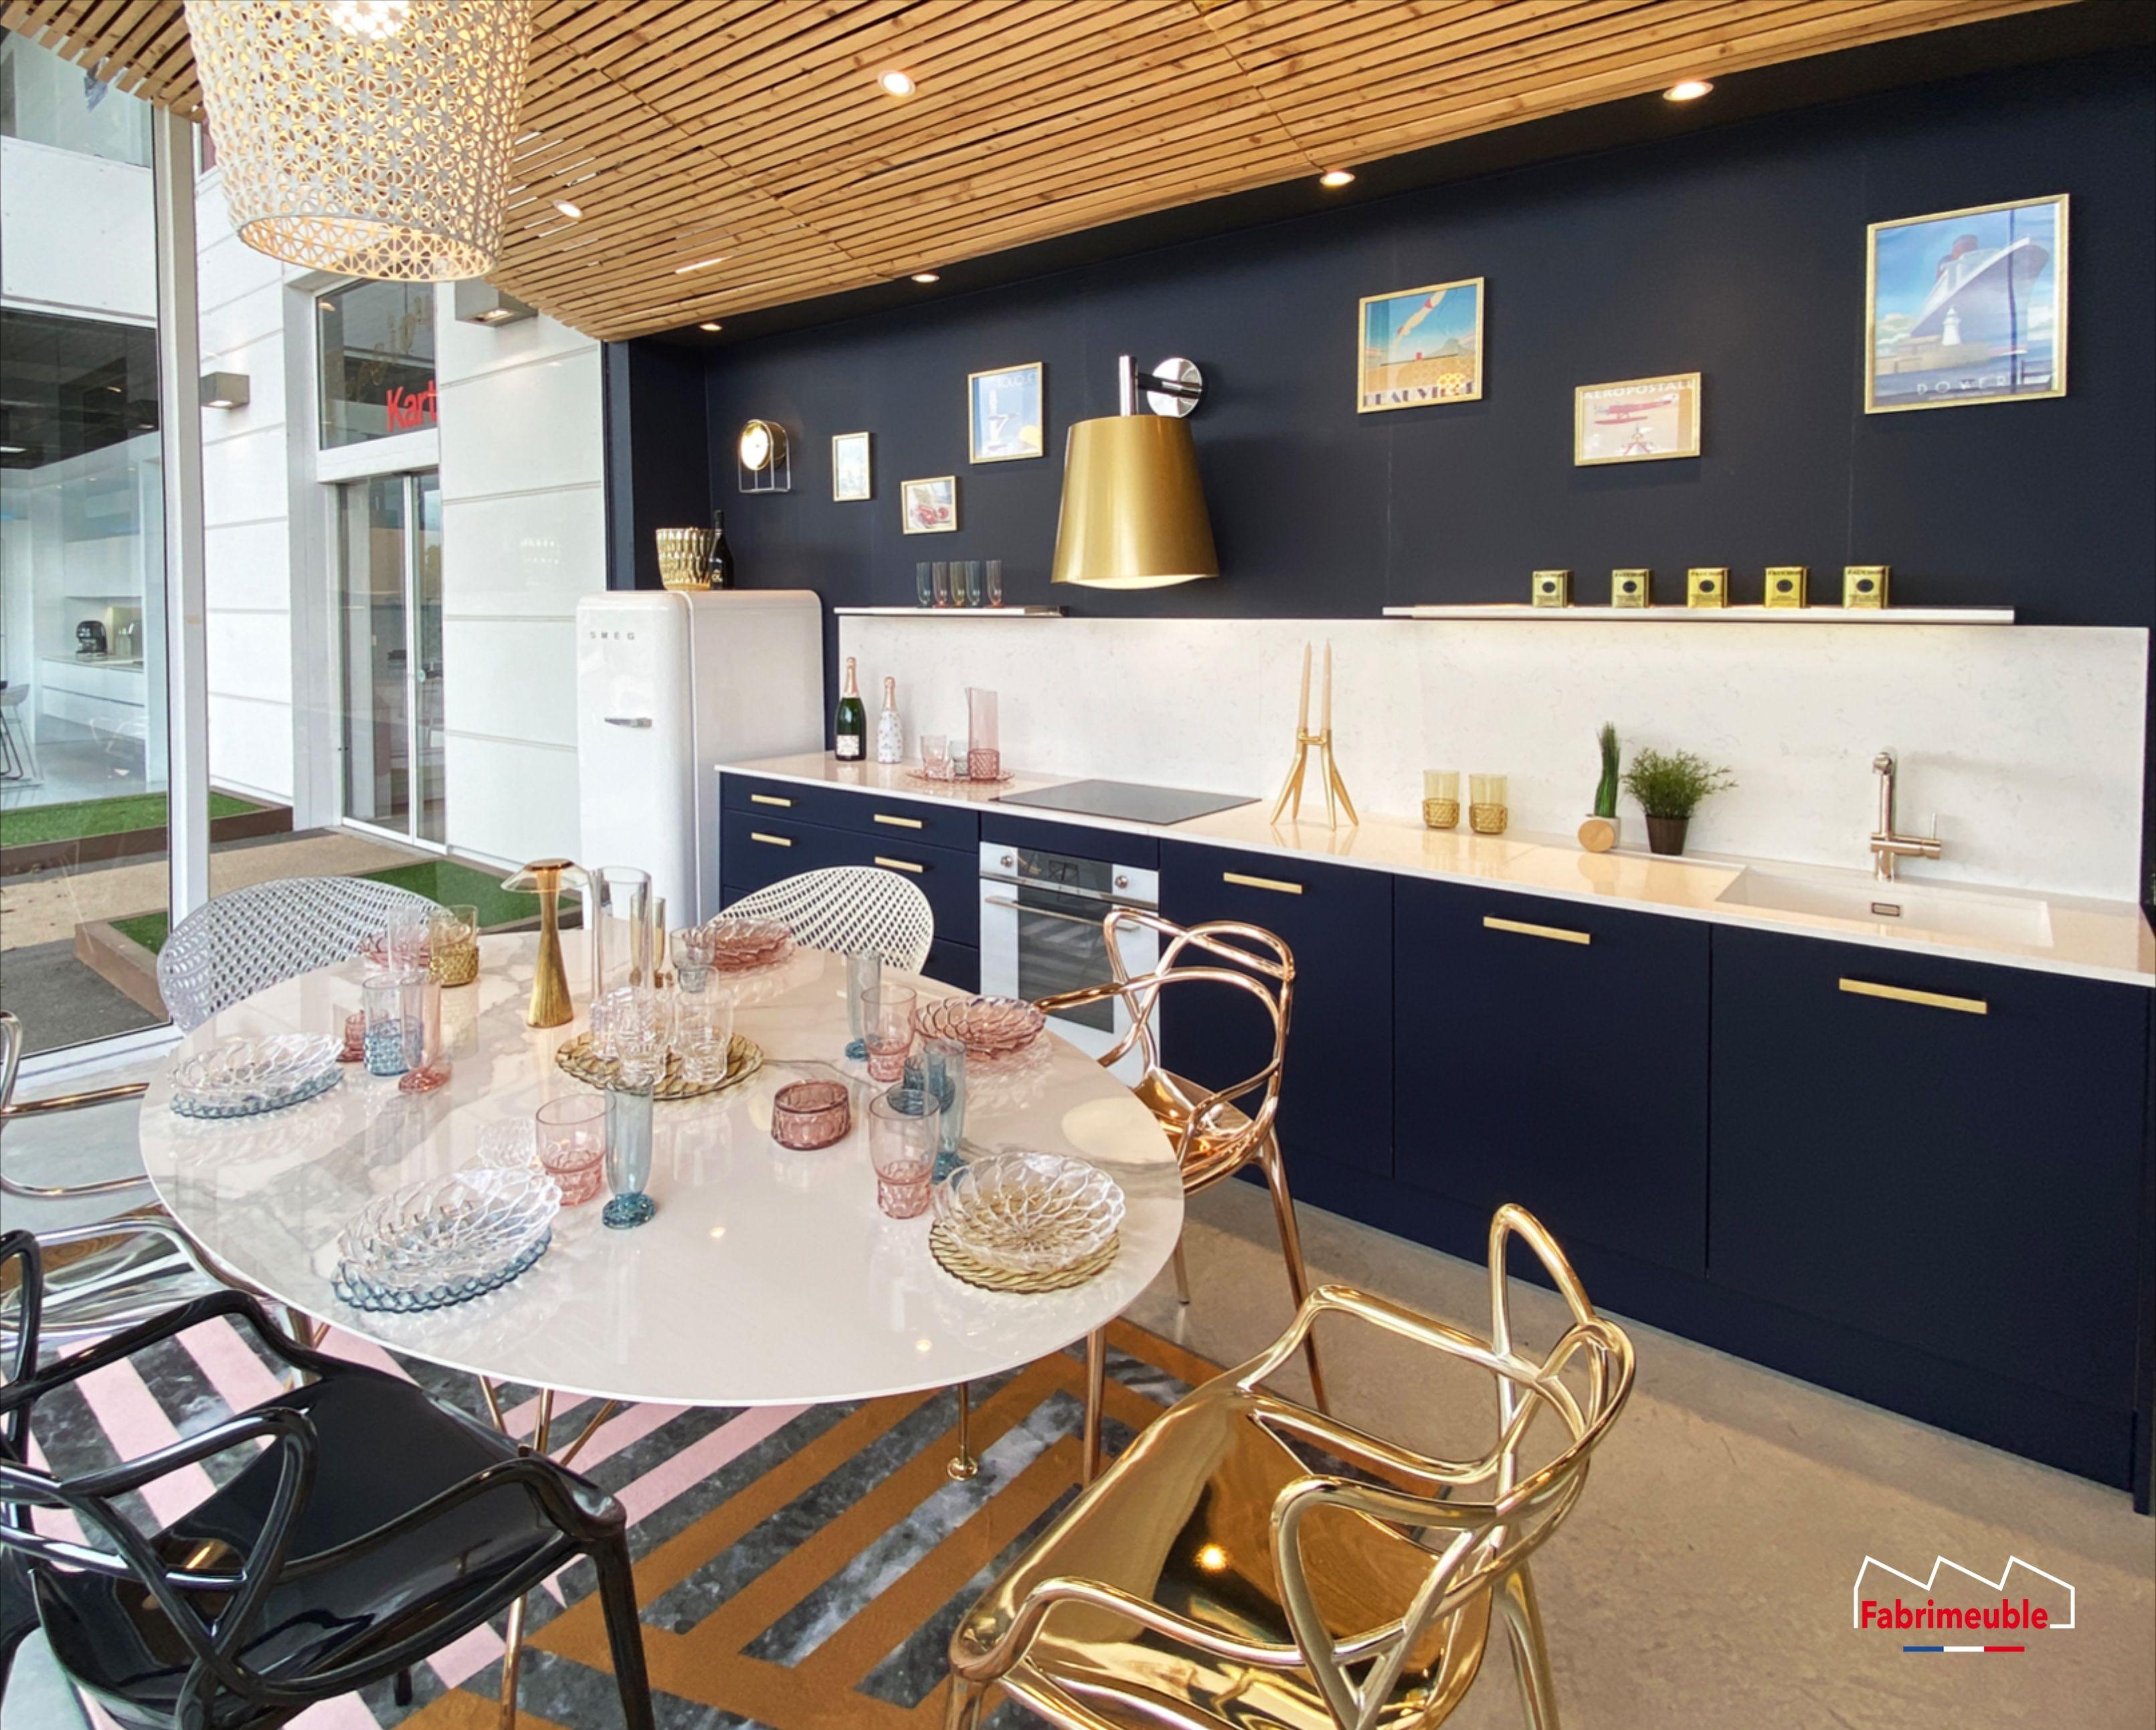 Cuisine Bleu Marine Et Or Bleu Nuit Art Deco Made In France En 2020 Fabricant Cuisine Cuisine Laquee Tapis Art Deco